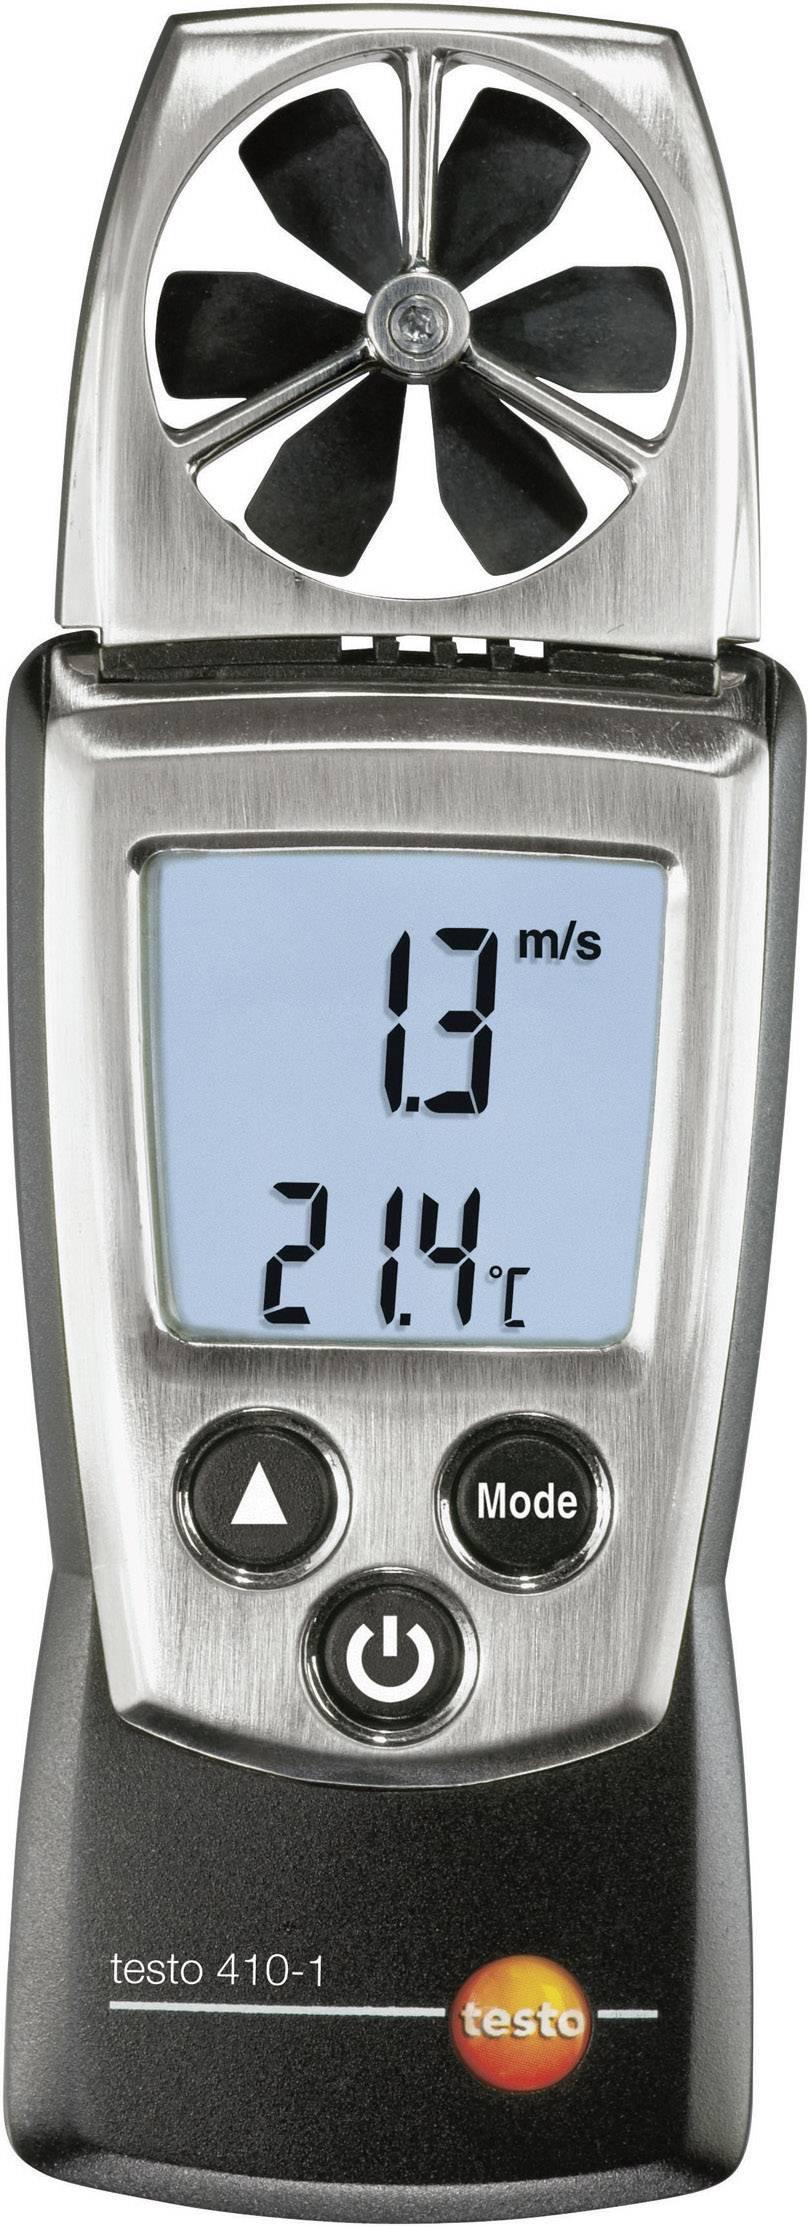 Anemometer testo 410-1, 0.4 - 20 m/s